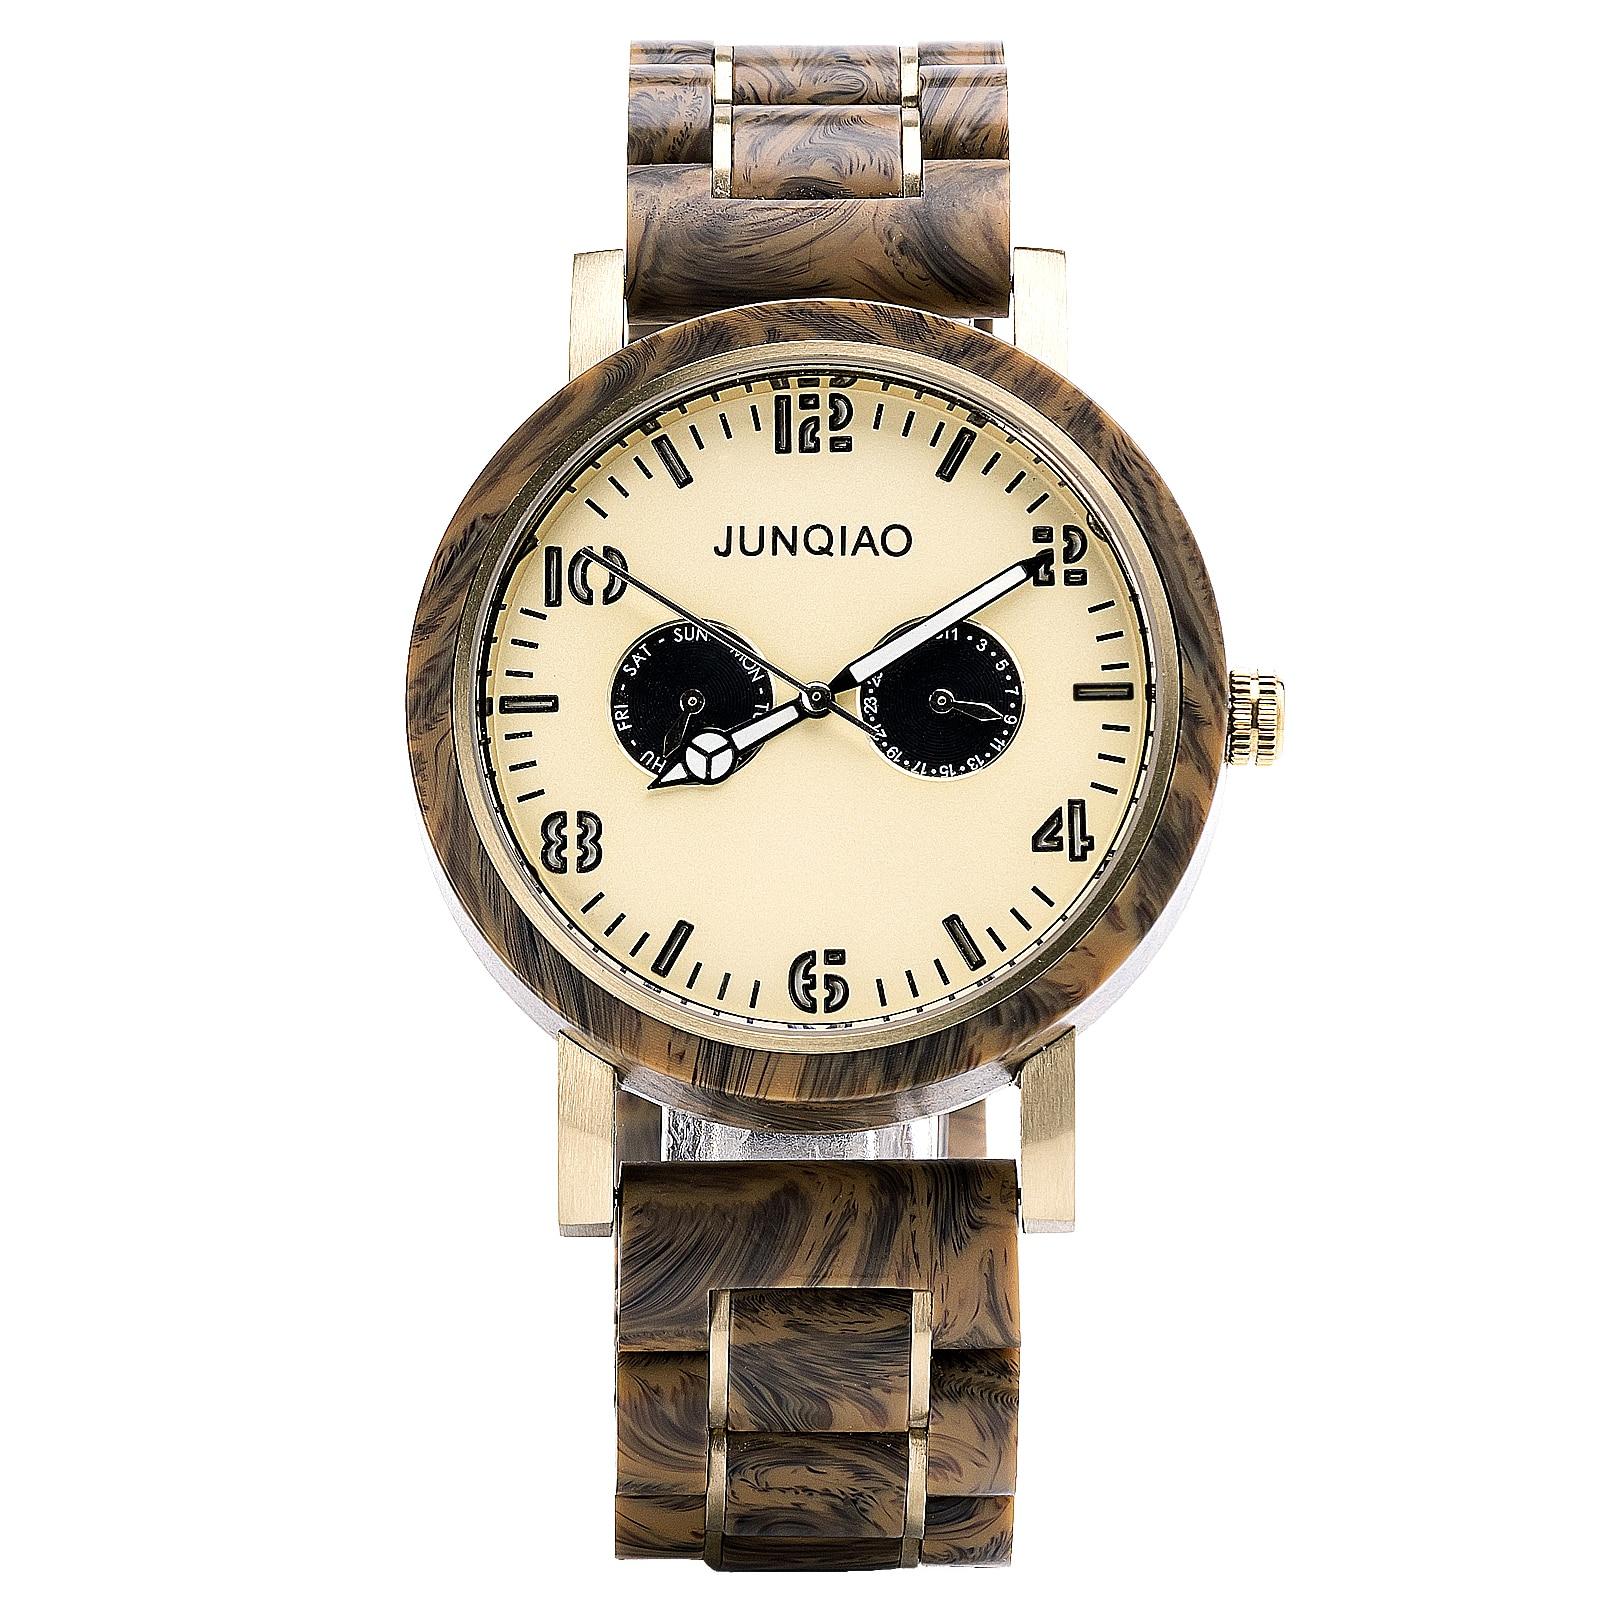 2020 watches men Casual Sport Top Brand Elegant wooden Luxury Military watch men Waterproof Resin Clock Relogio Masculino